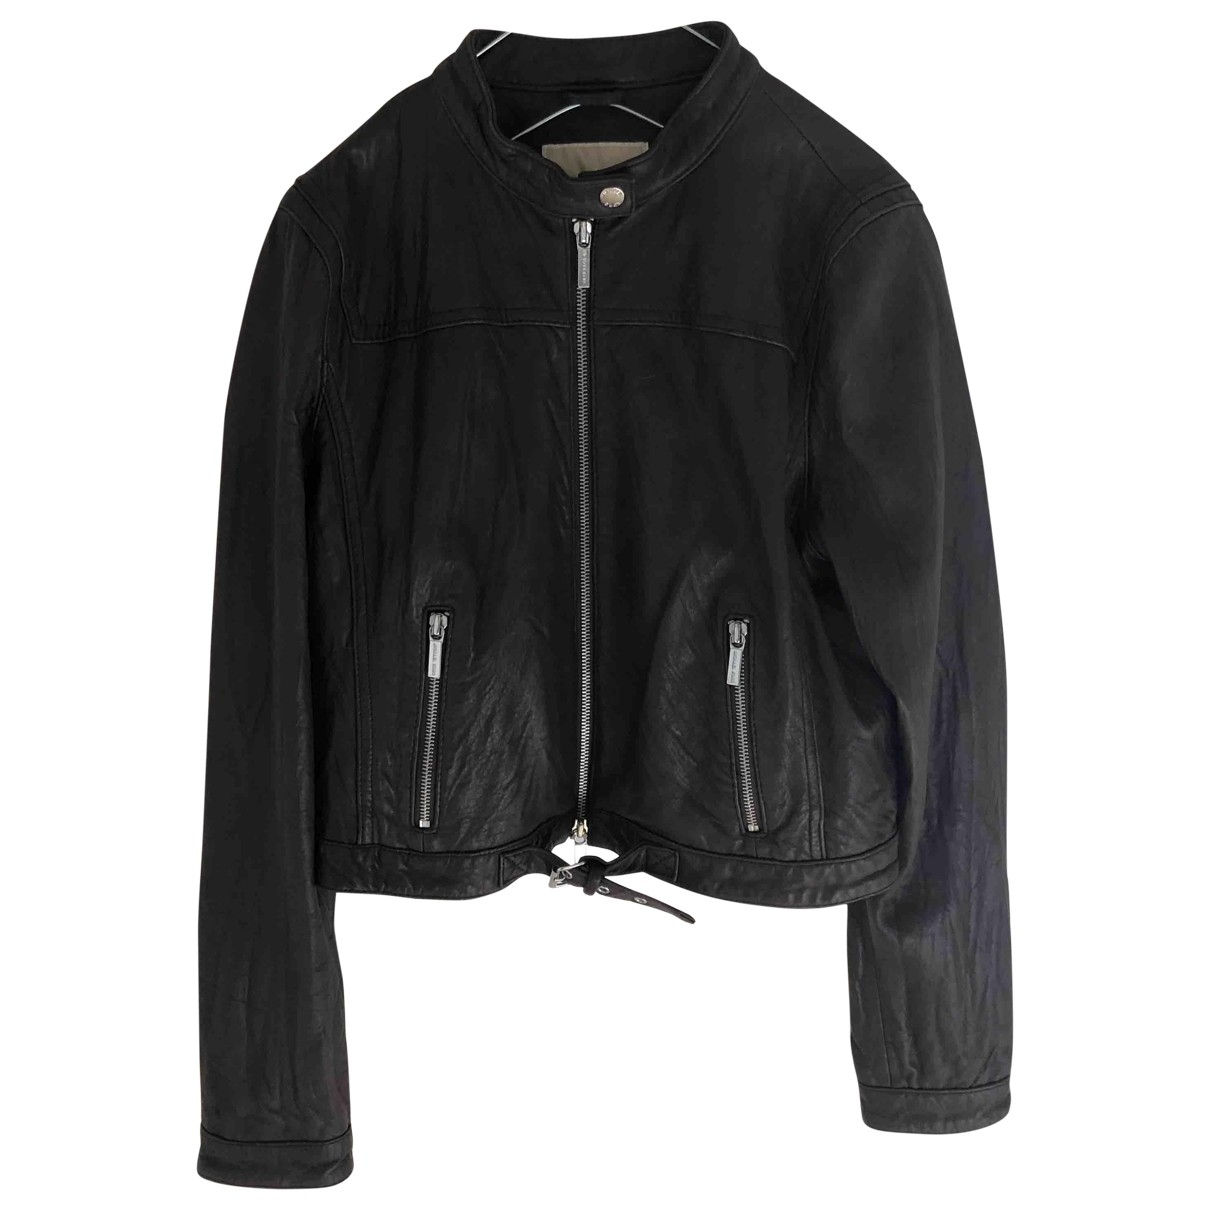 Michael Kors \N Brown Leather jacket for Women L International